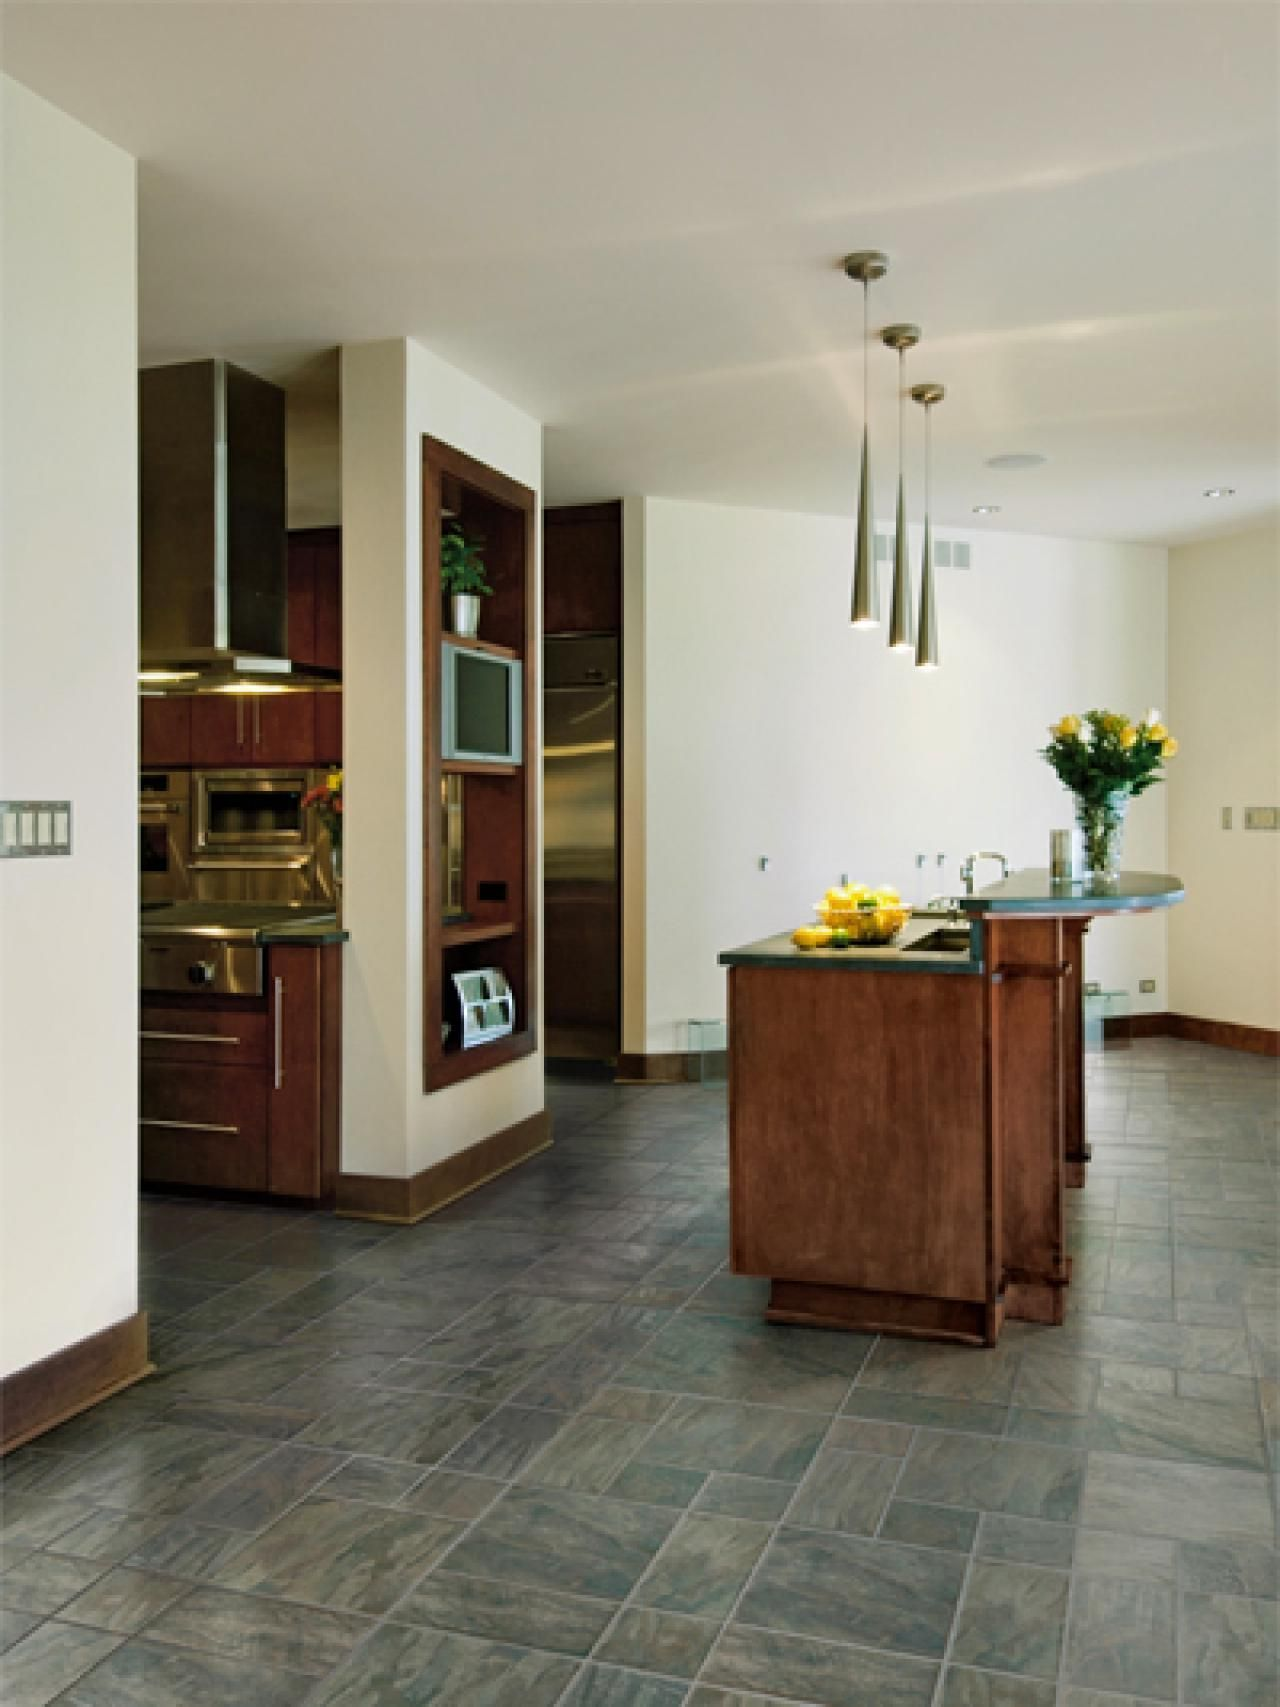 Basement Floor Epoxy And Sealer Basement Flooring Pinterest - Best flooring for basements that get water